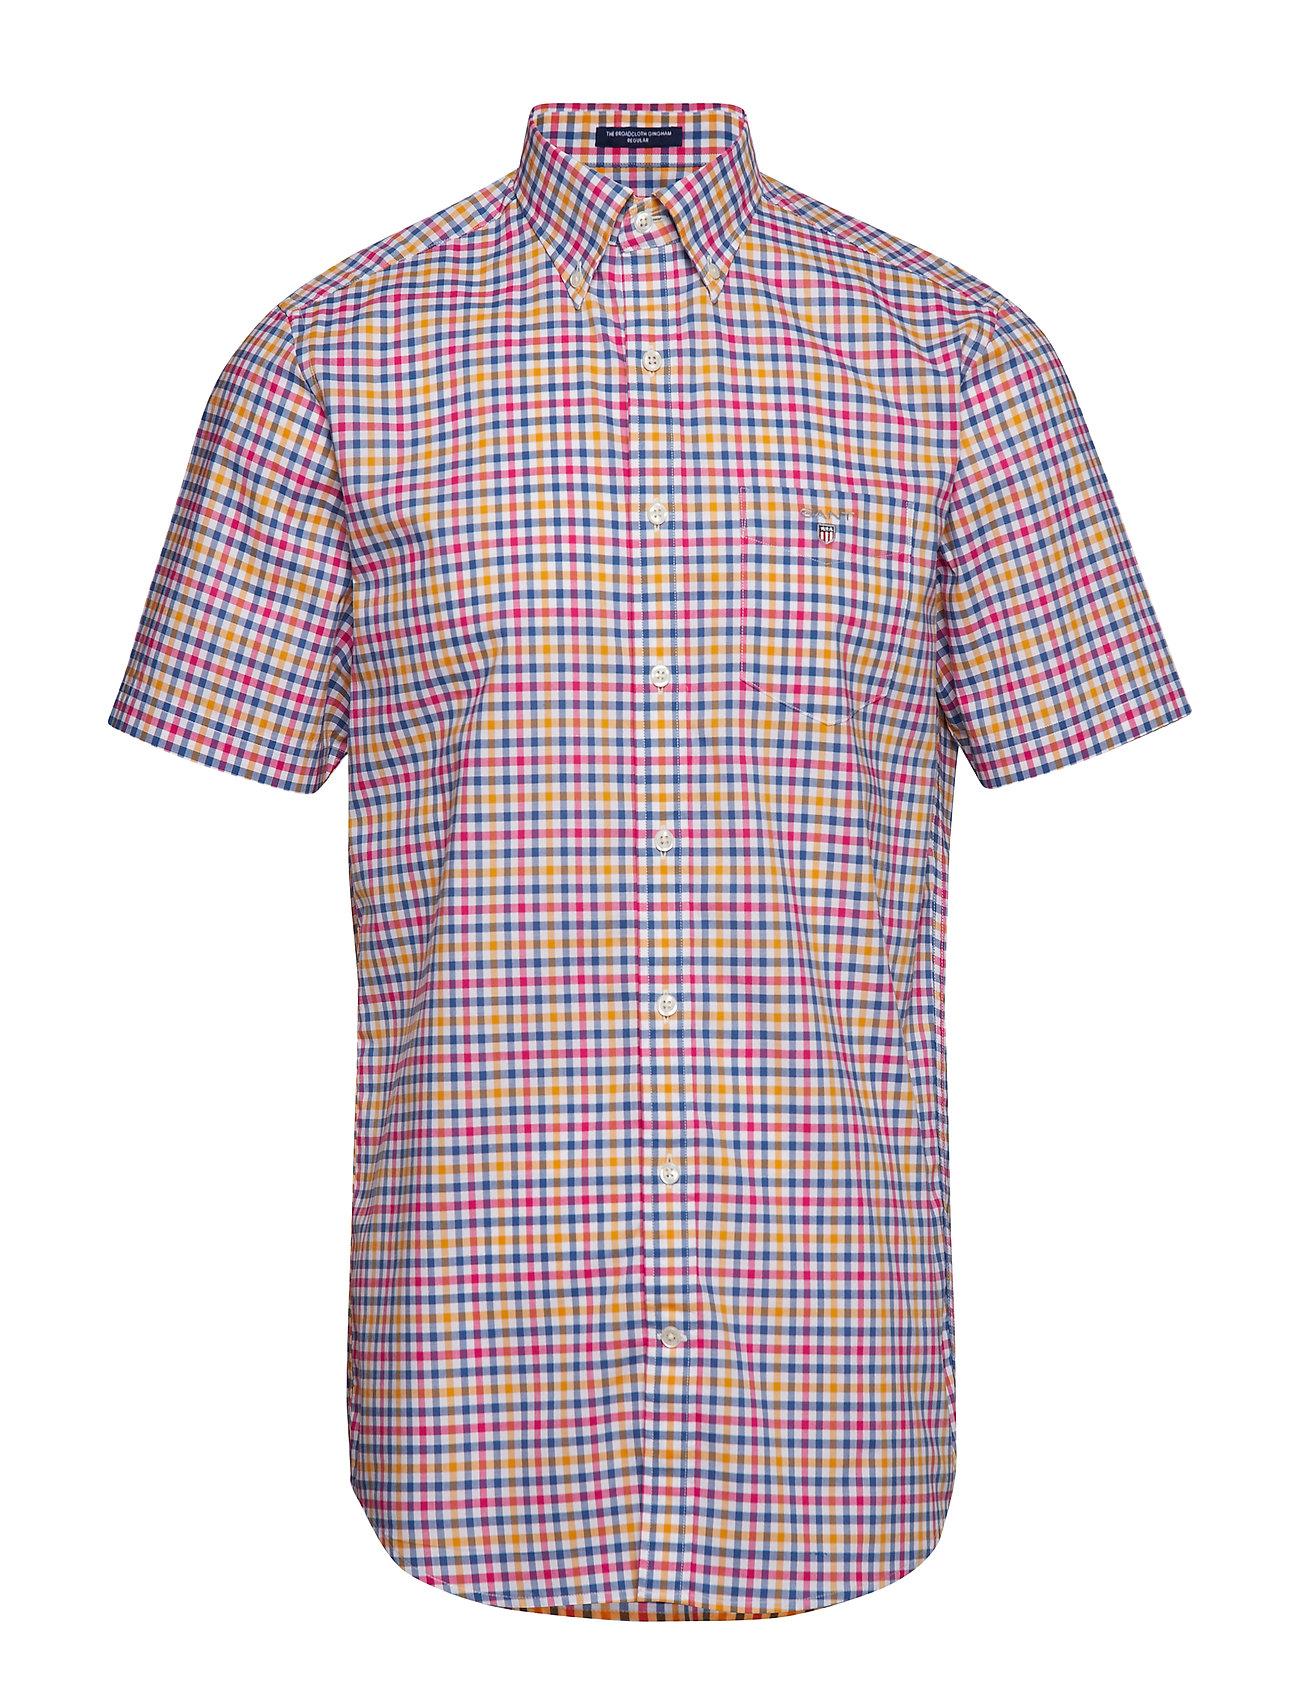 Gant THE B-CLOTH 3COL GINGHAM REG SS BD - POSEIDON BLUE